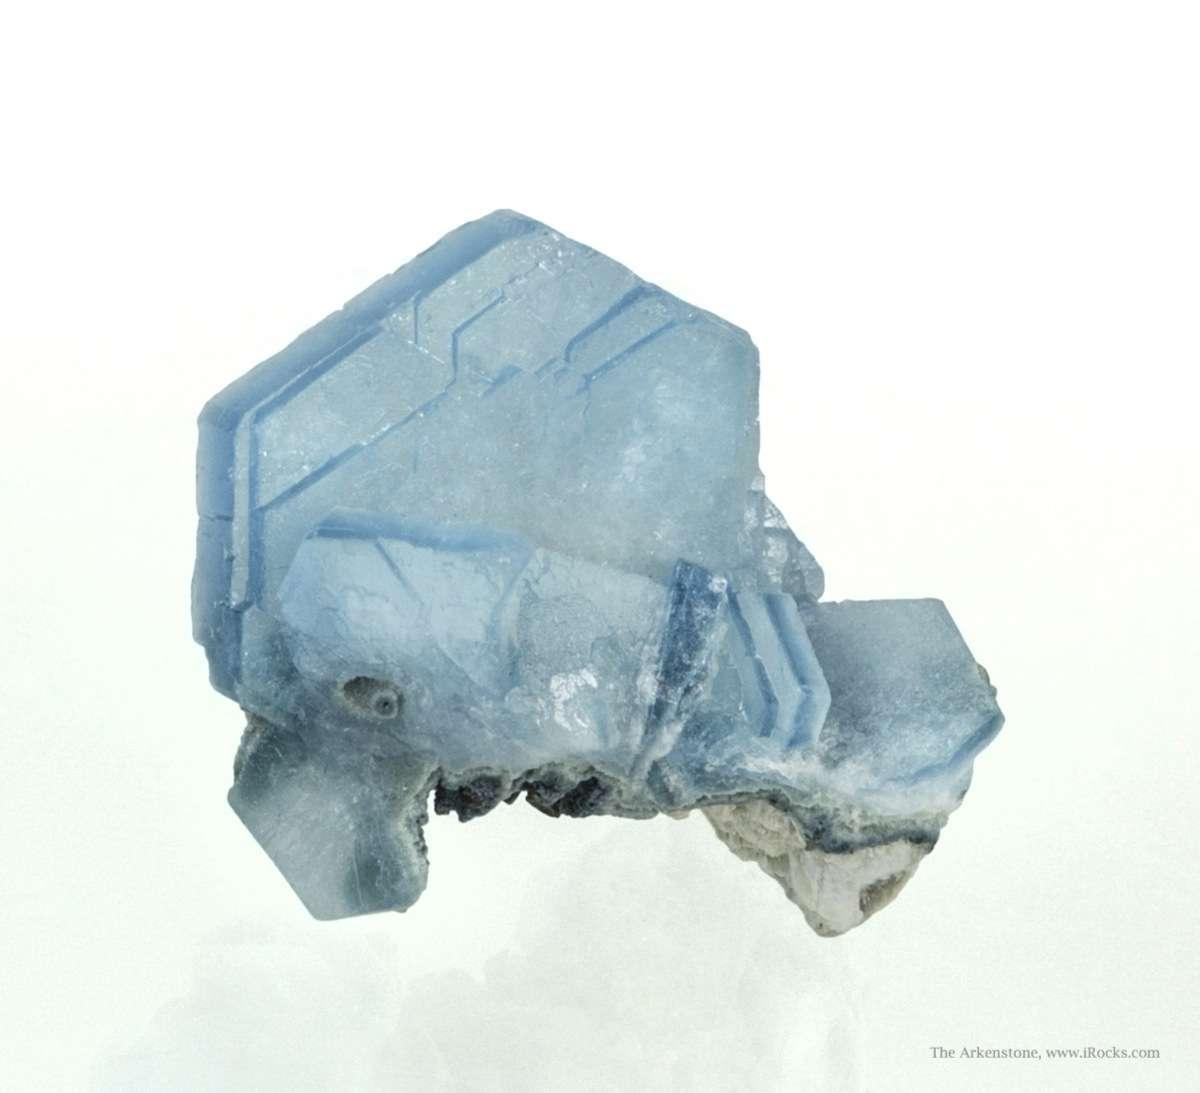 An aesthetic cluster tabular lustrous translucent sky blue cesium rich